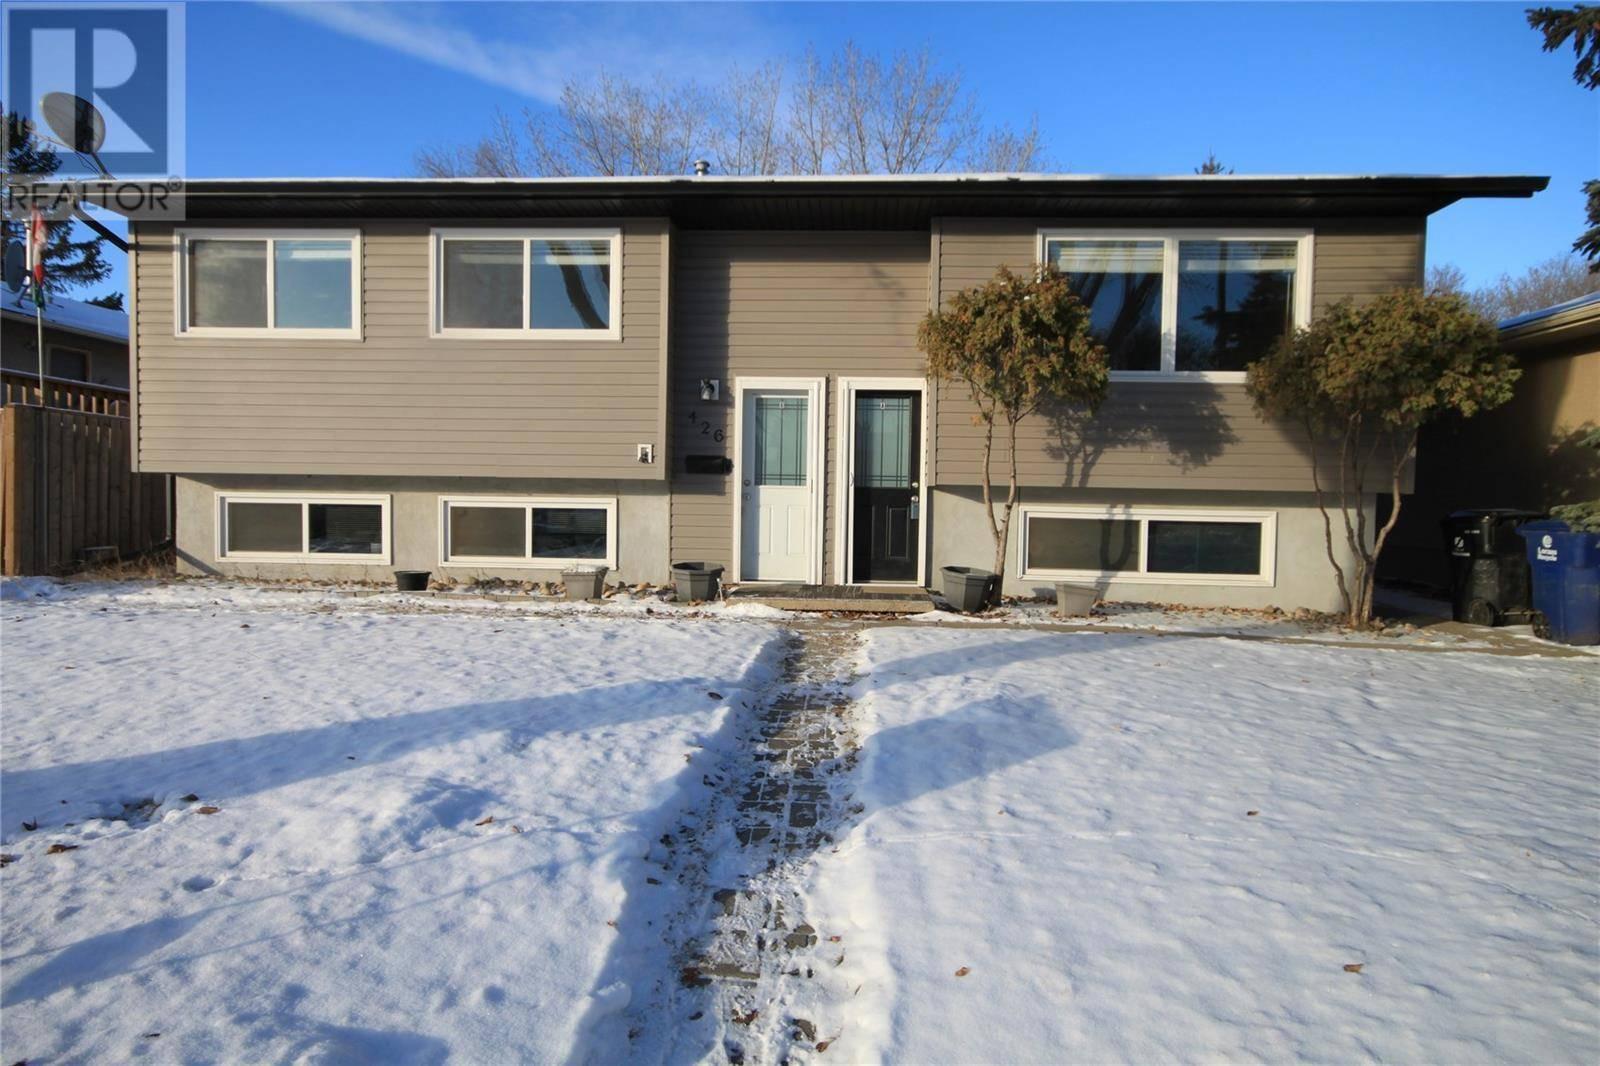 House for sale at 426 Mckercher Dr Saskatoon Saskatchewan - MLS: SK793576